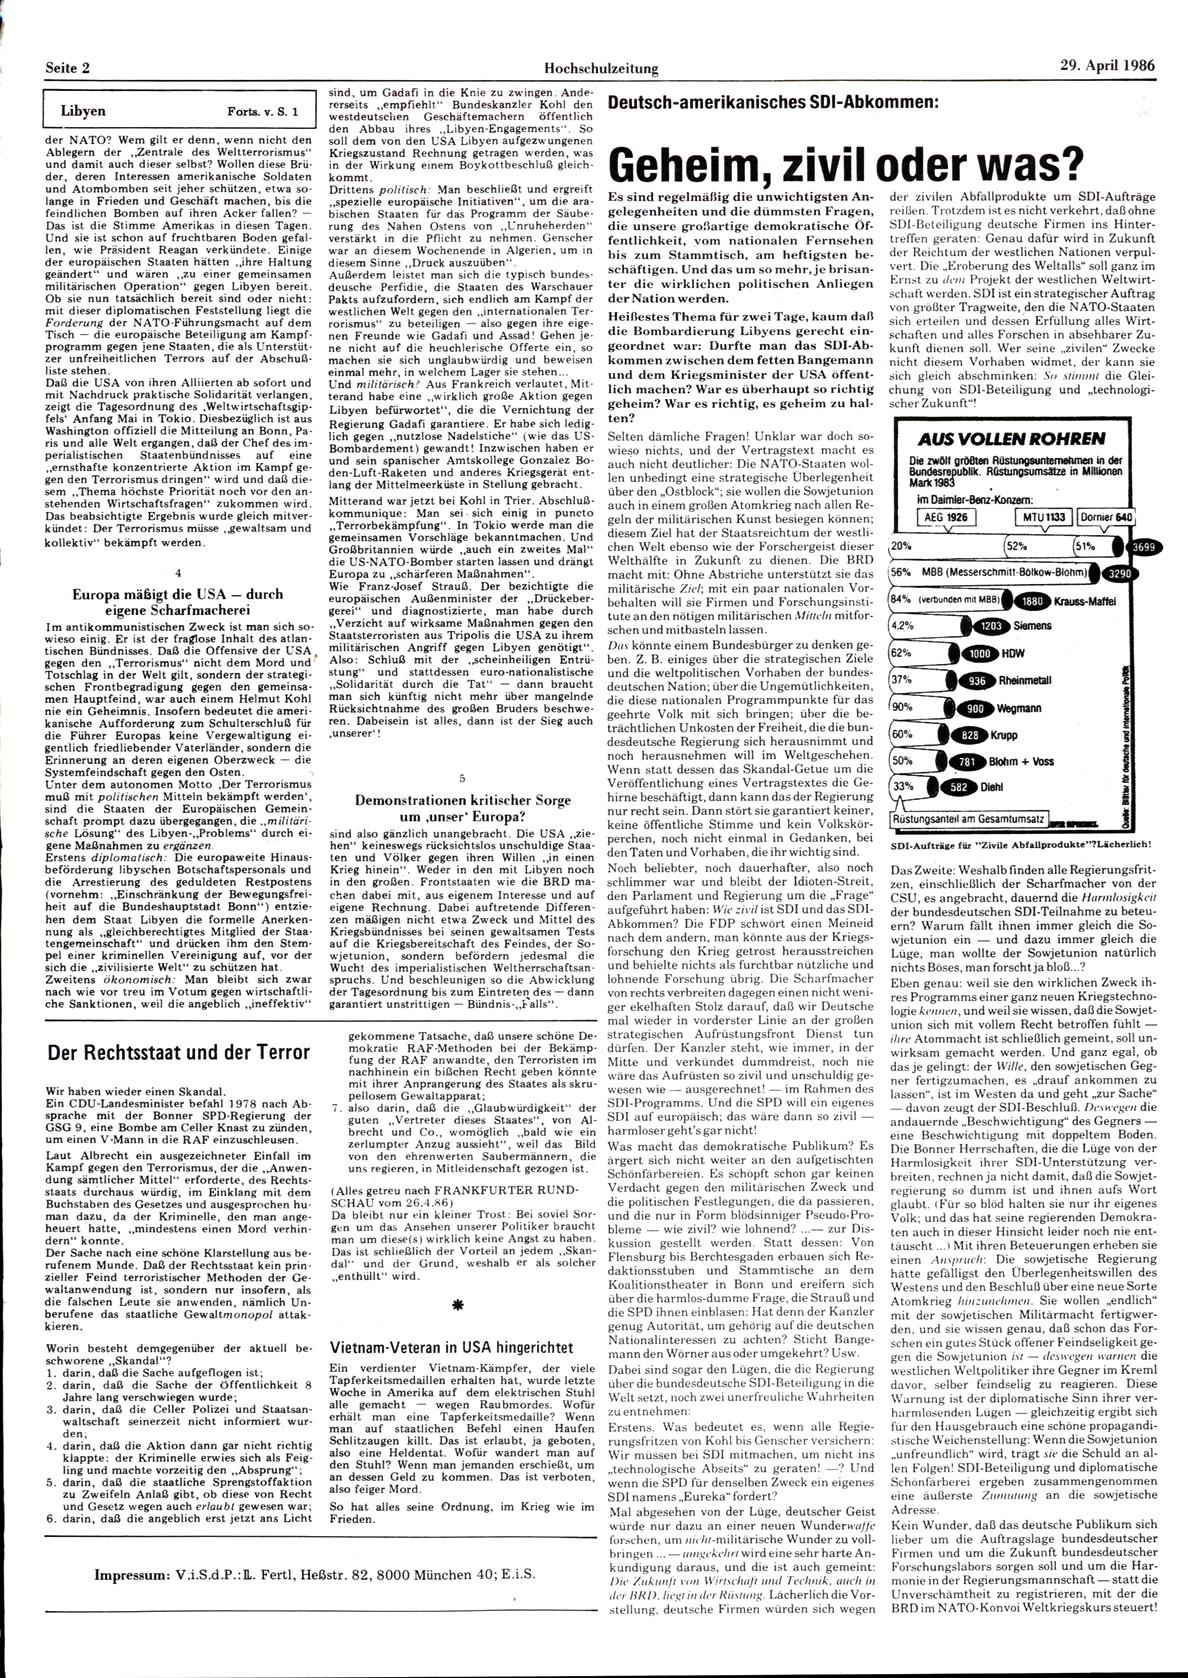 Bochum_BHZ_19860429_127_002